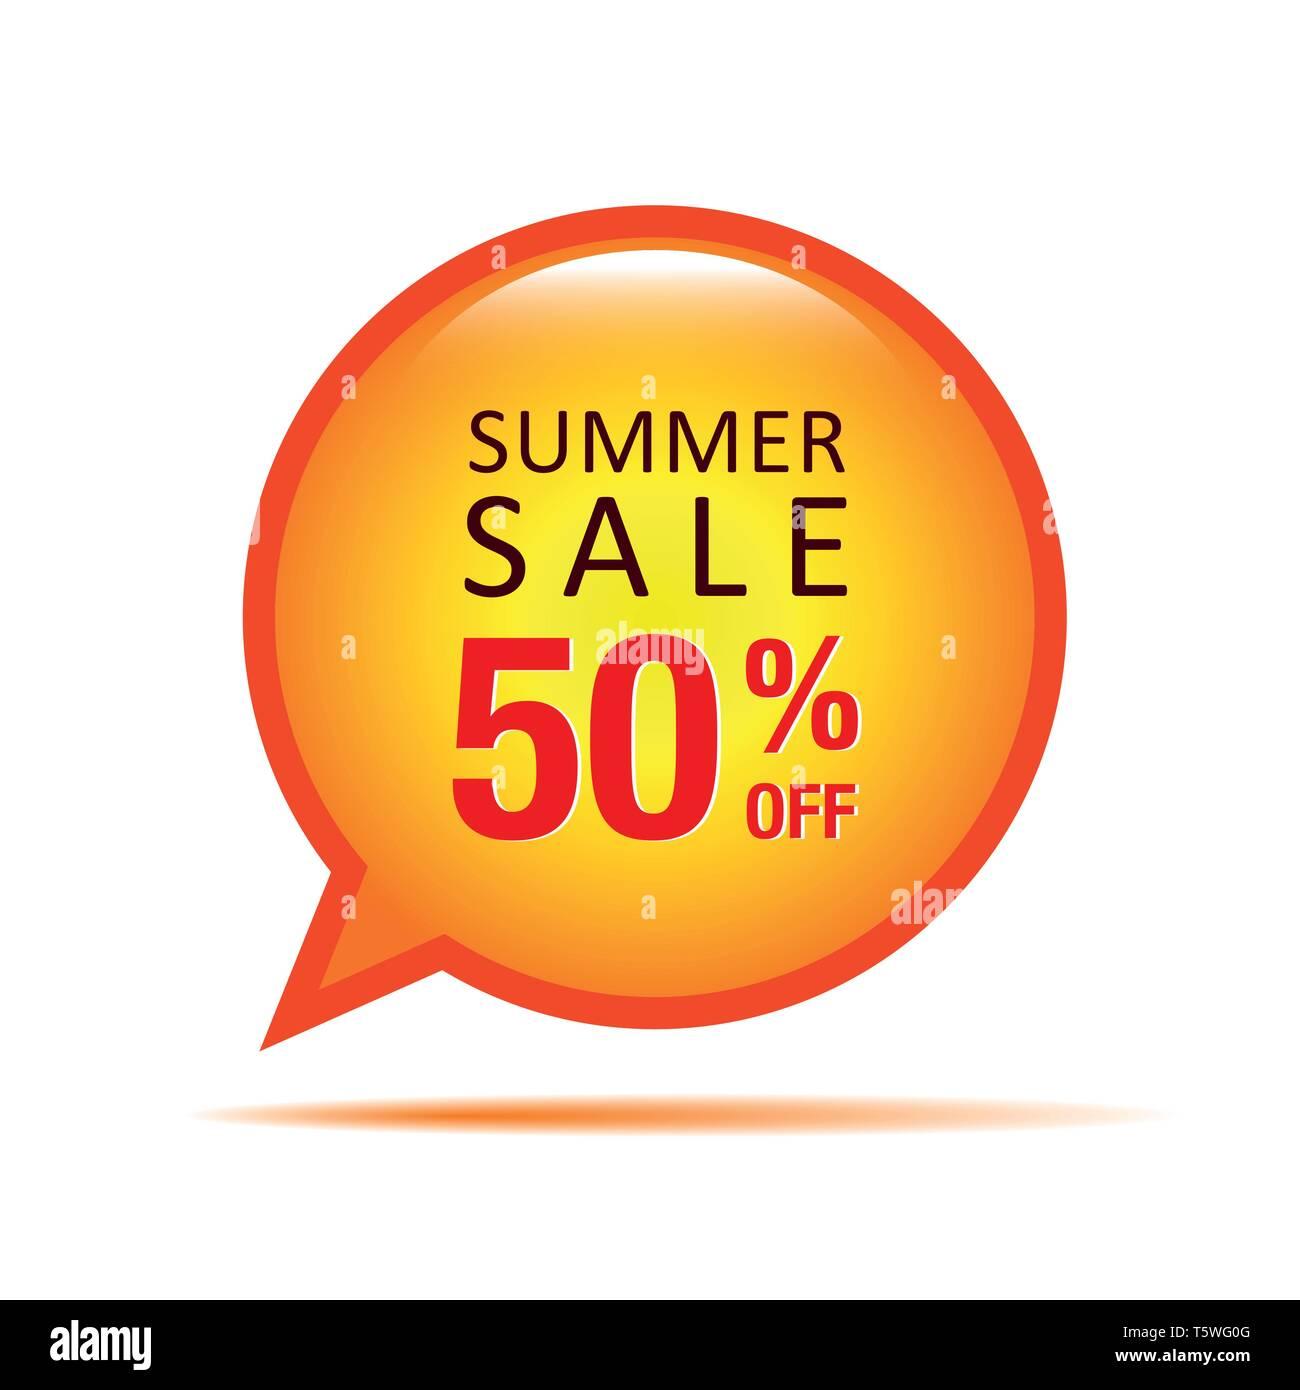 summer sale speach bubble 50 percent off vector illustration EPS10 - Stock Image